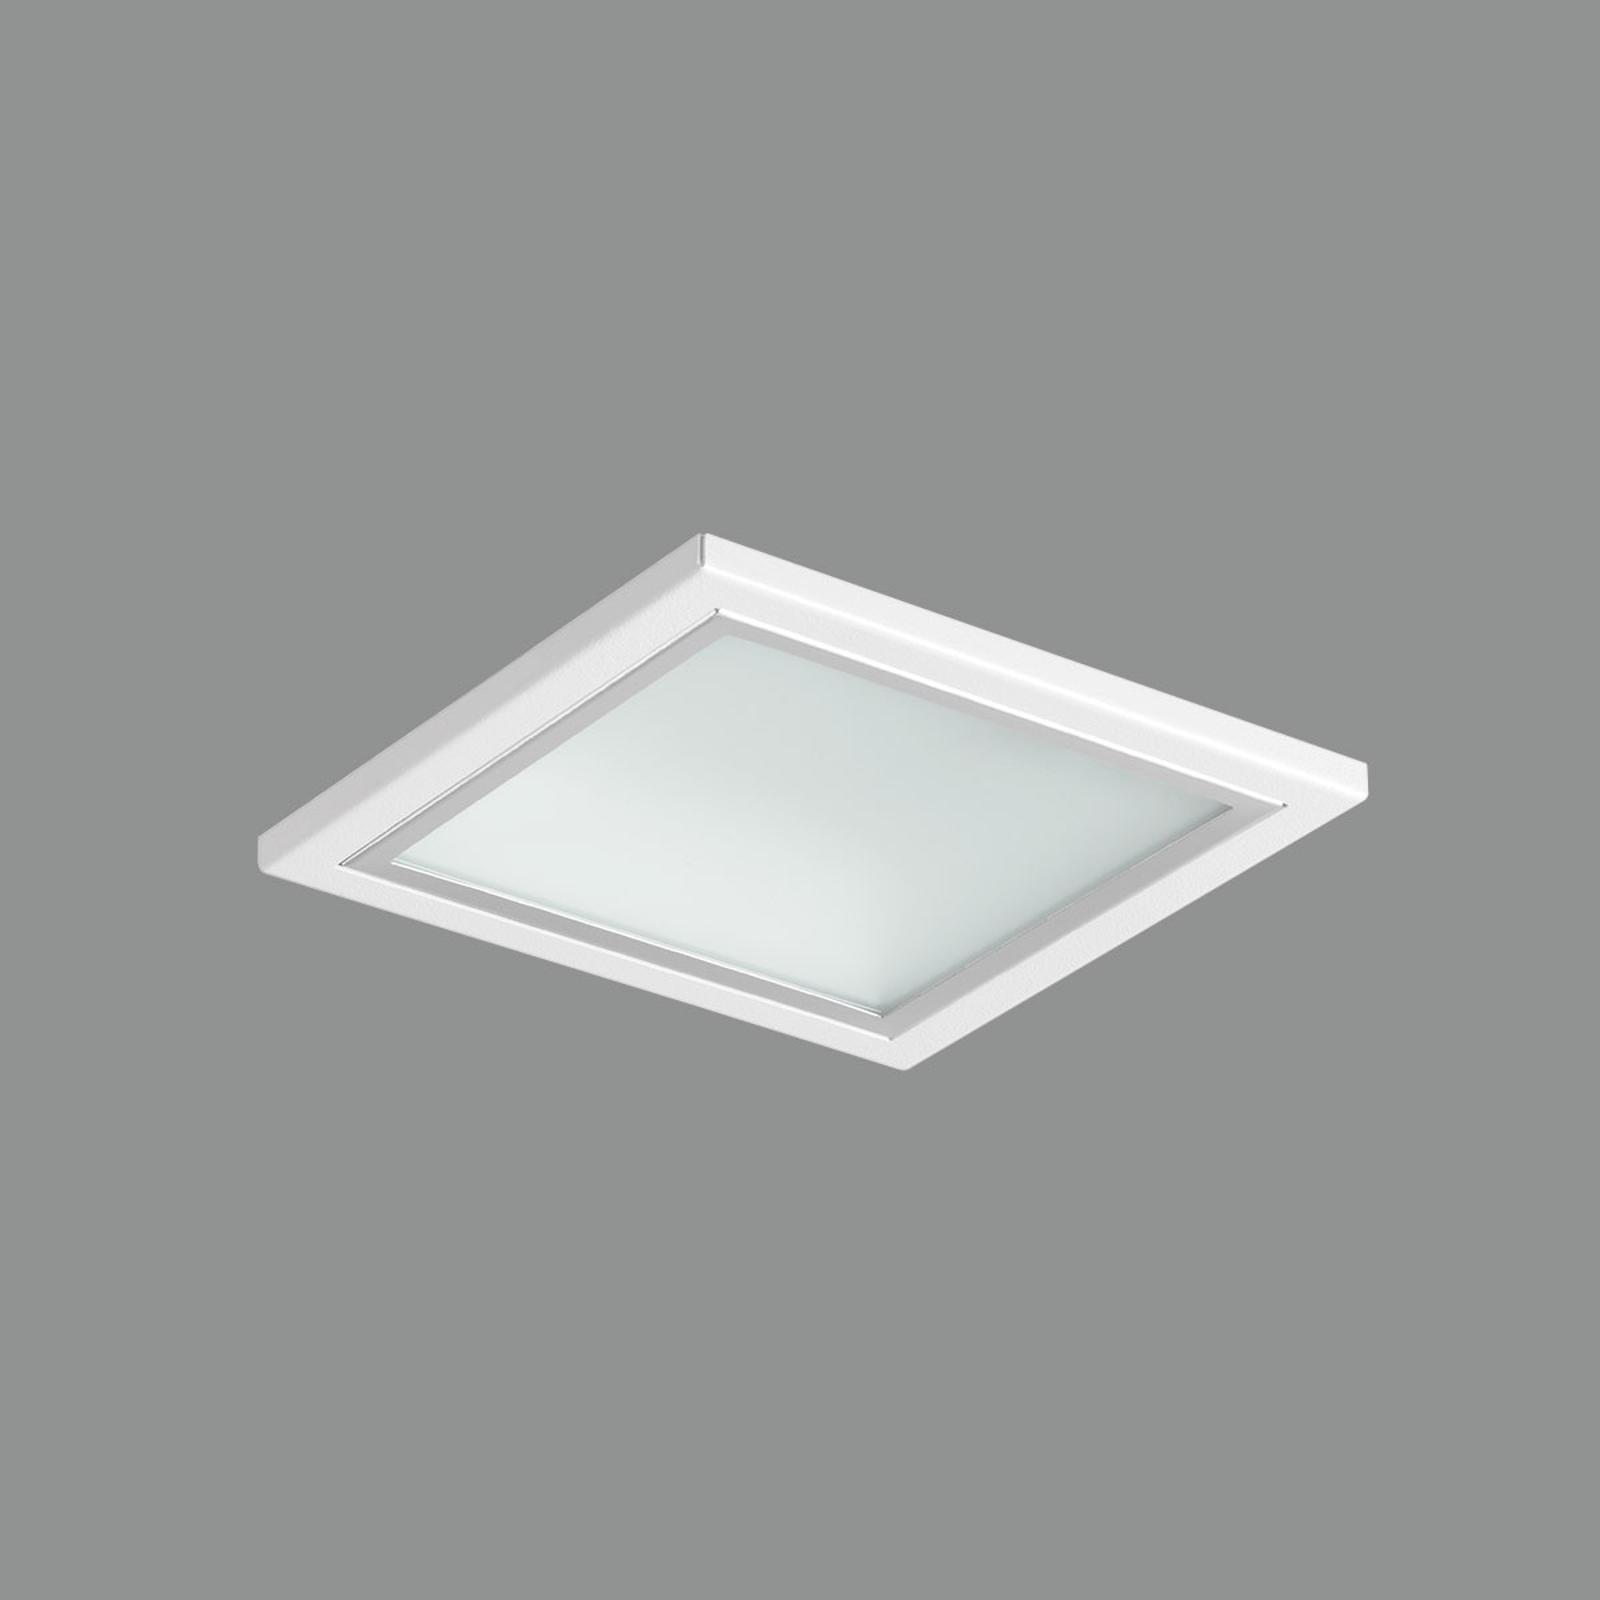 LED-Downlight Noviel S PRO, 20 W, 79°, 4.000 K